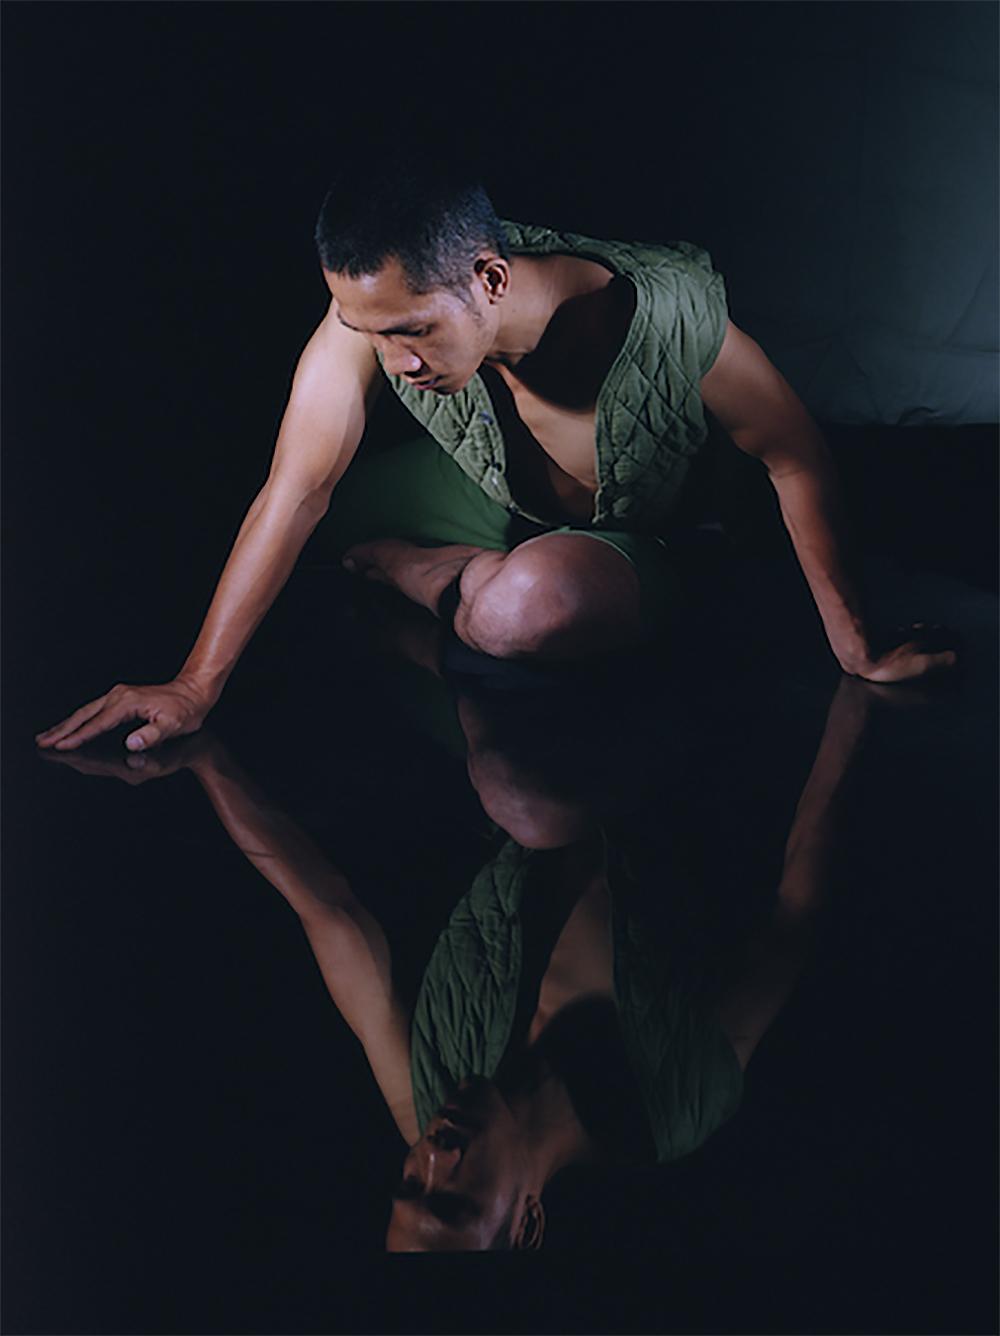 Bruce Yonemoto, Beyond South: Vietnam (Caravaggio), 2010 c-print edition of 7 116 x 98,5 cm - 45 3/4 x 38 3/4 inches (framed)